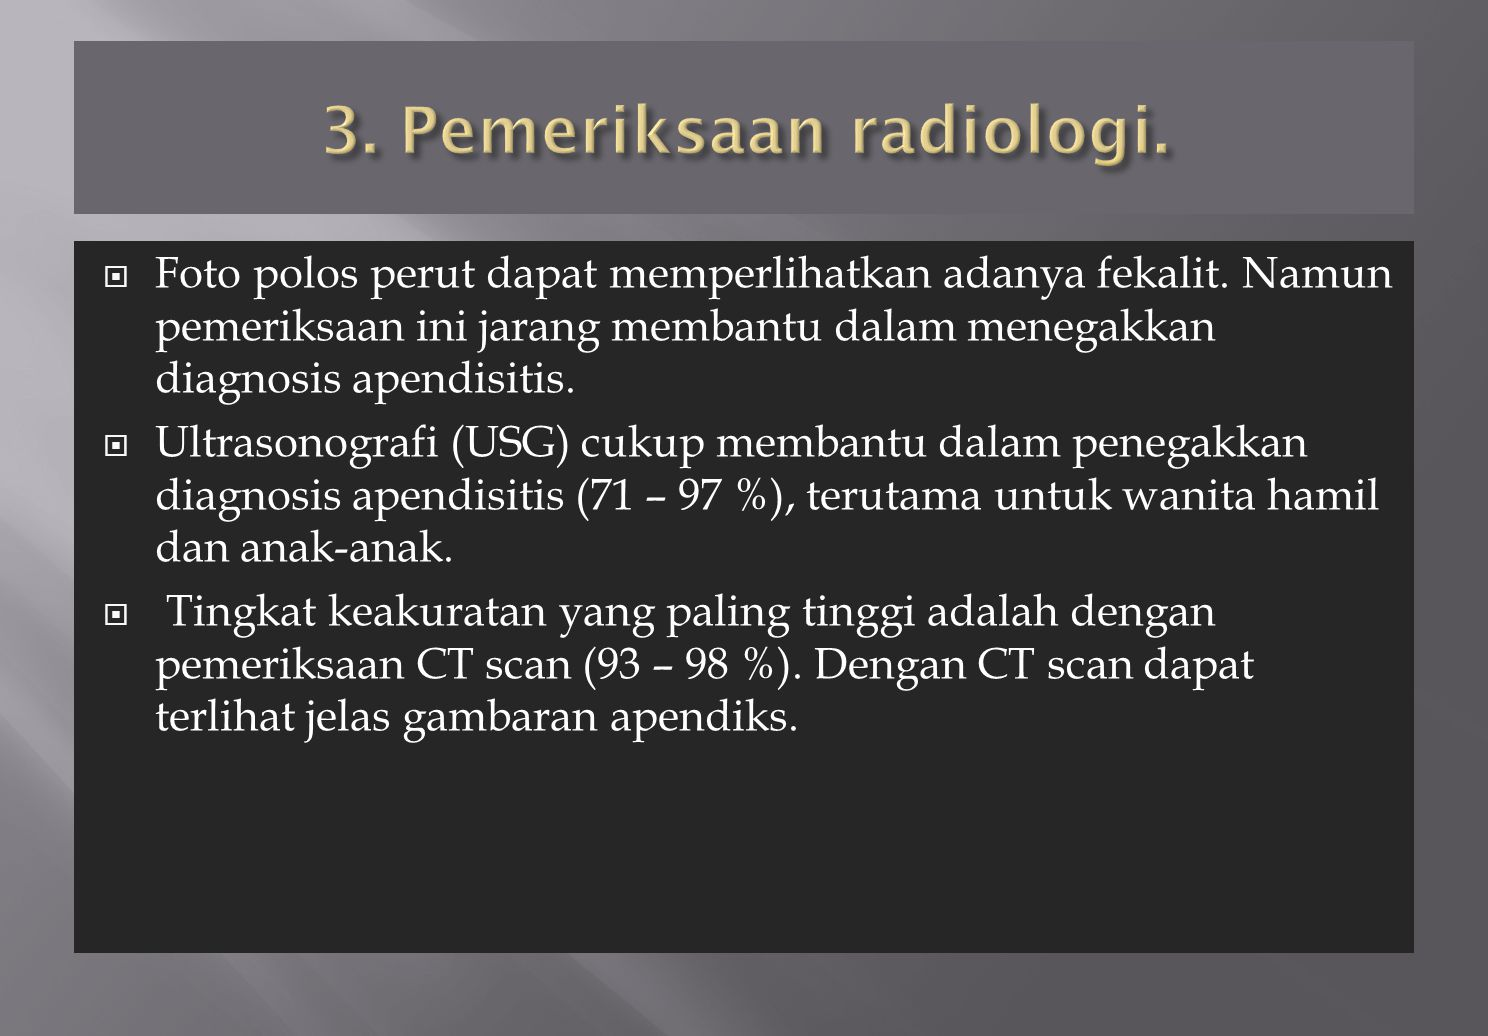 3. Pemeriksaan radiologi.